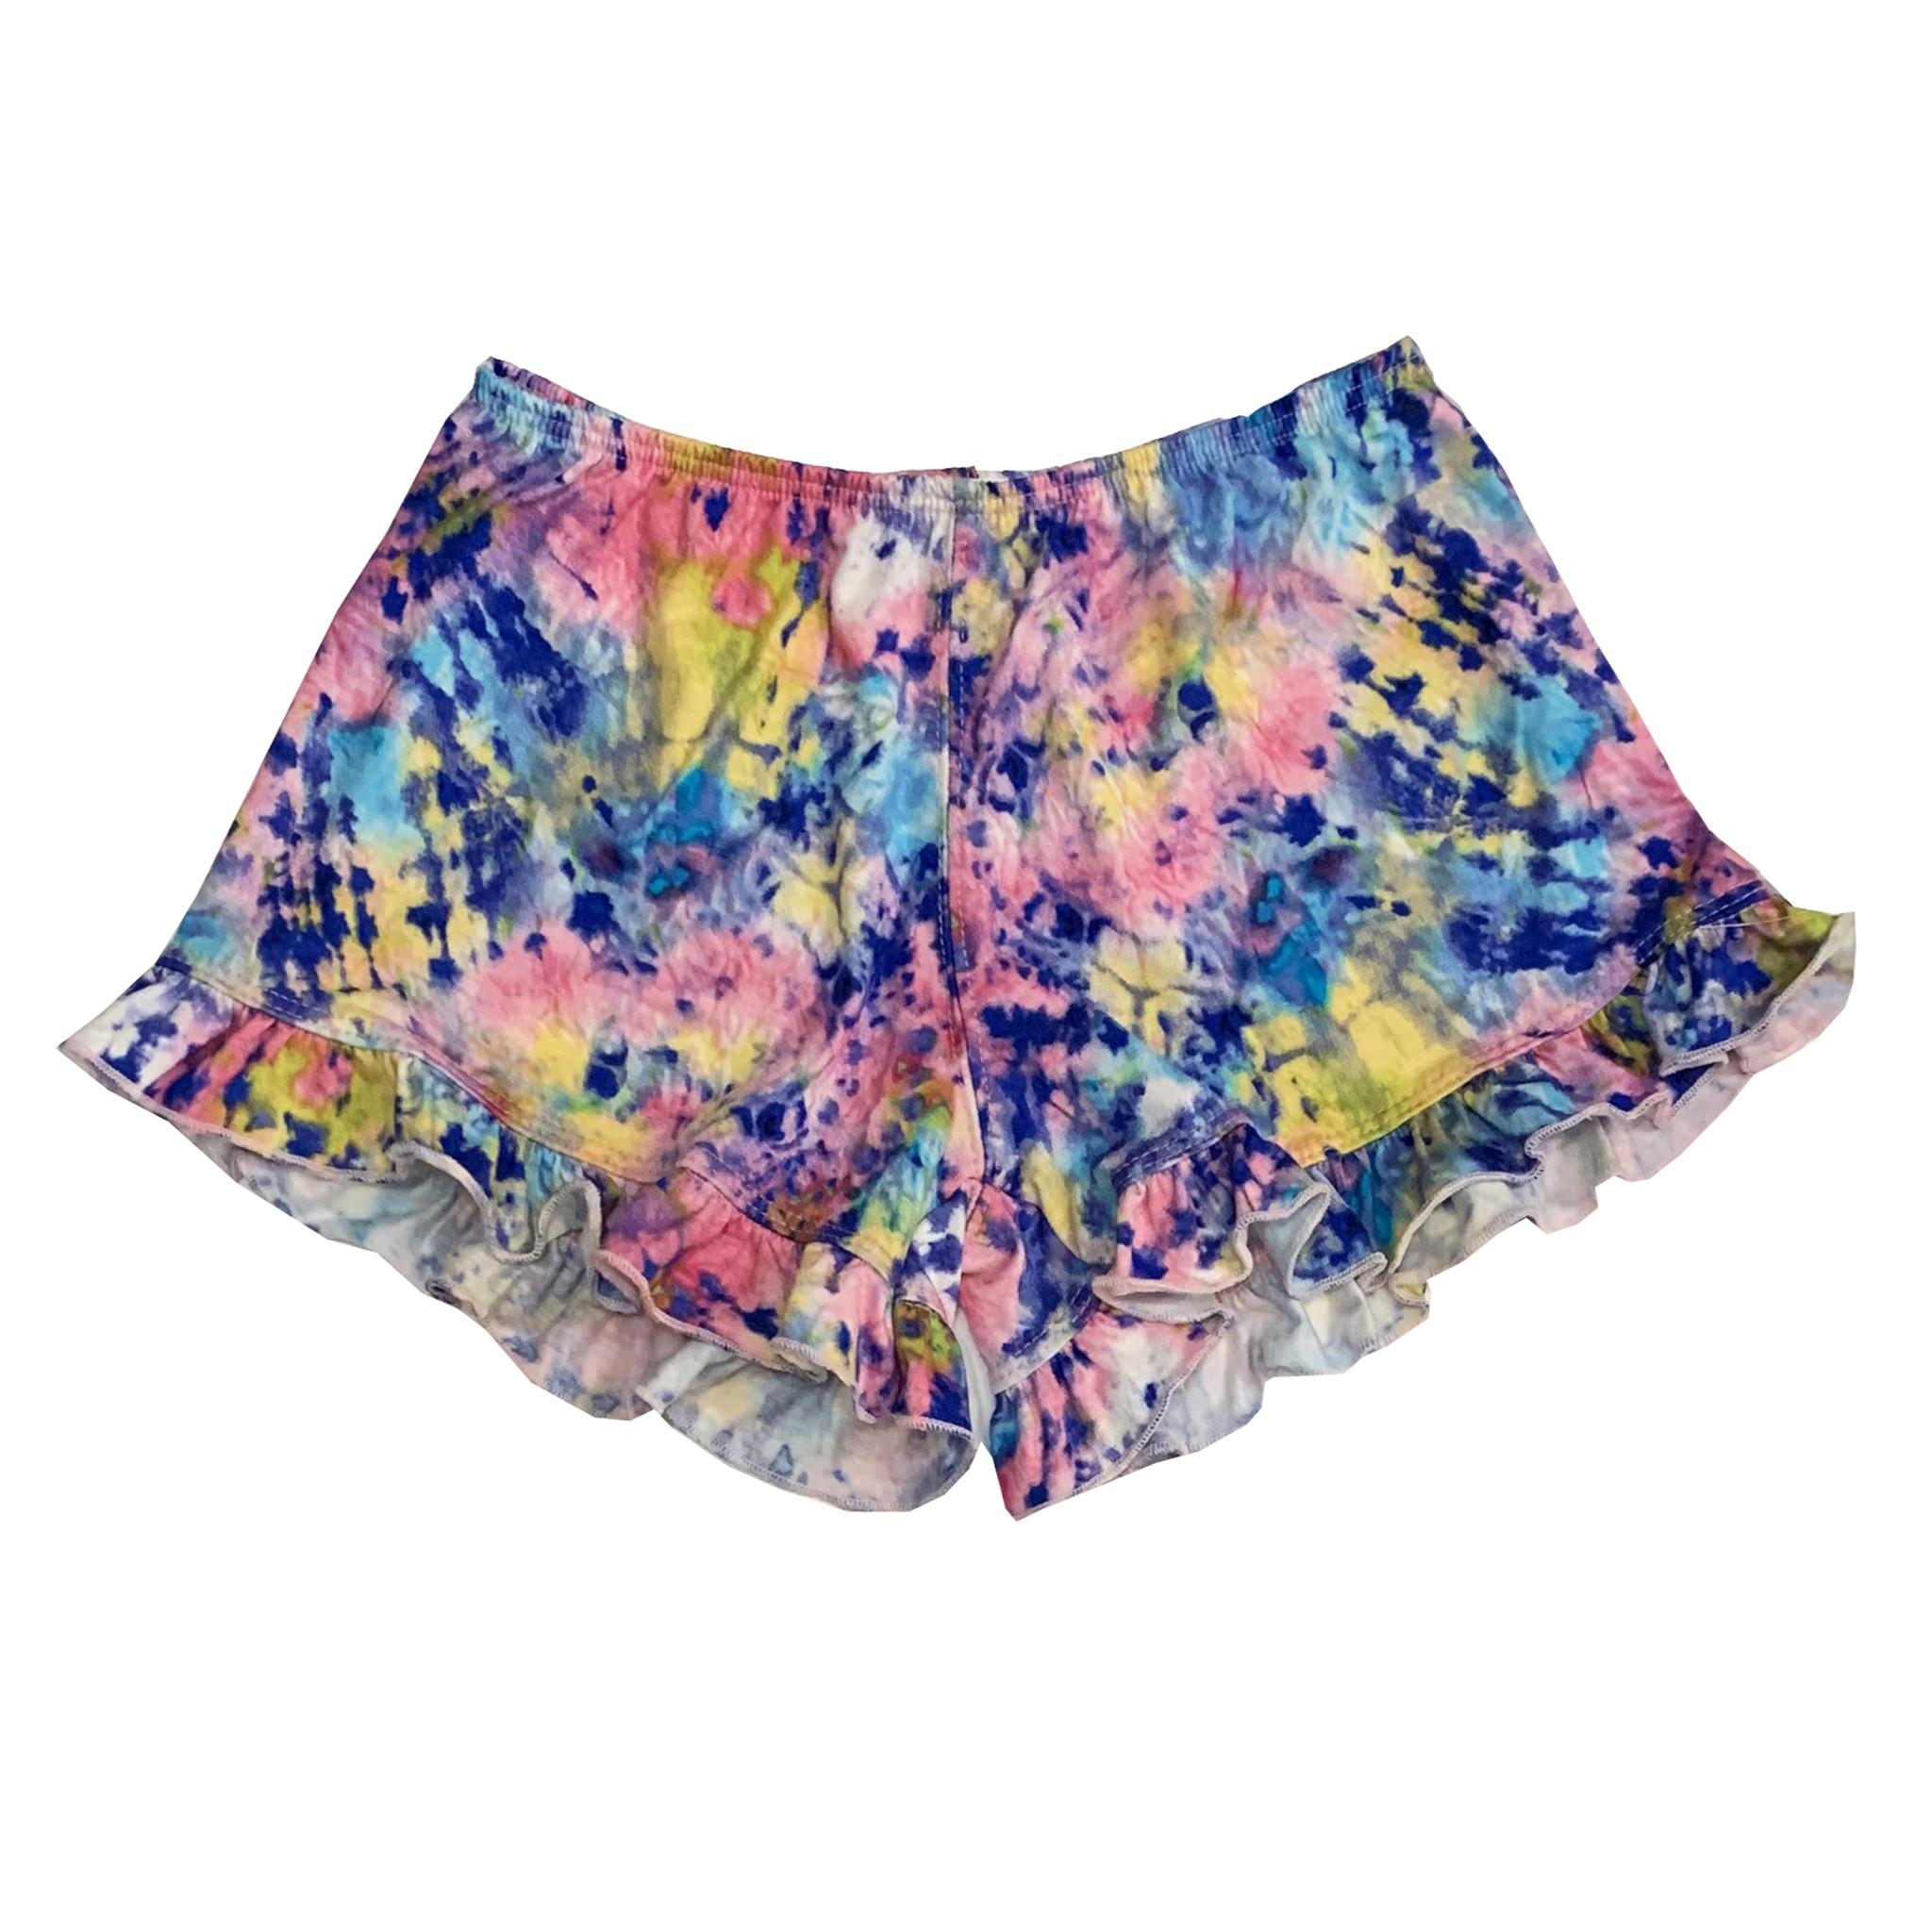 Dori Creations Splatter Dye Ruffle Shorts